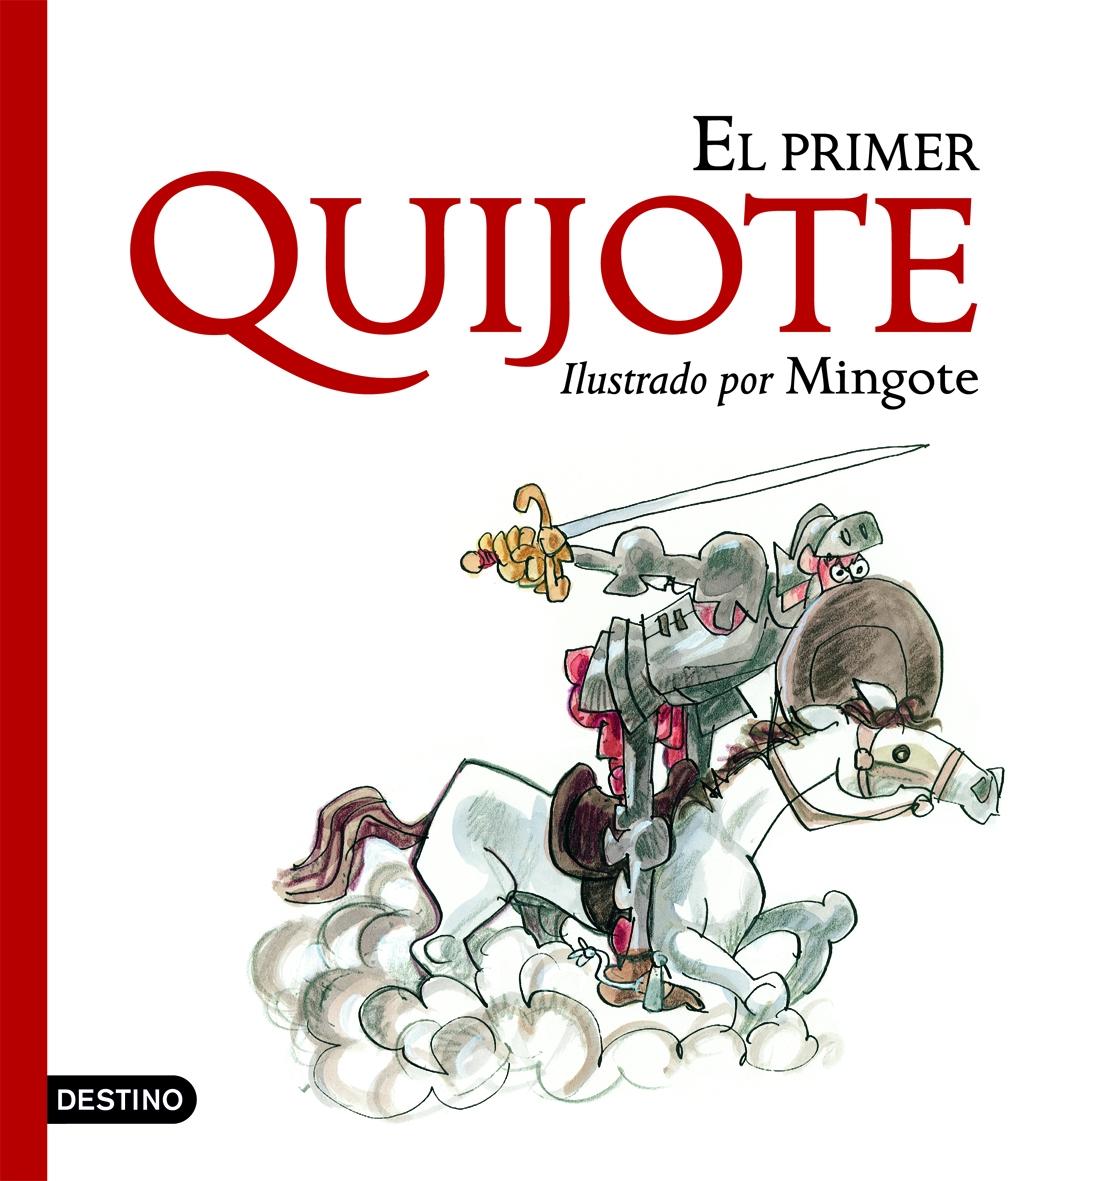 El primer Quijote libro infantil